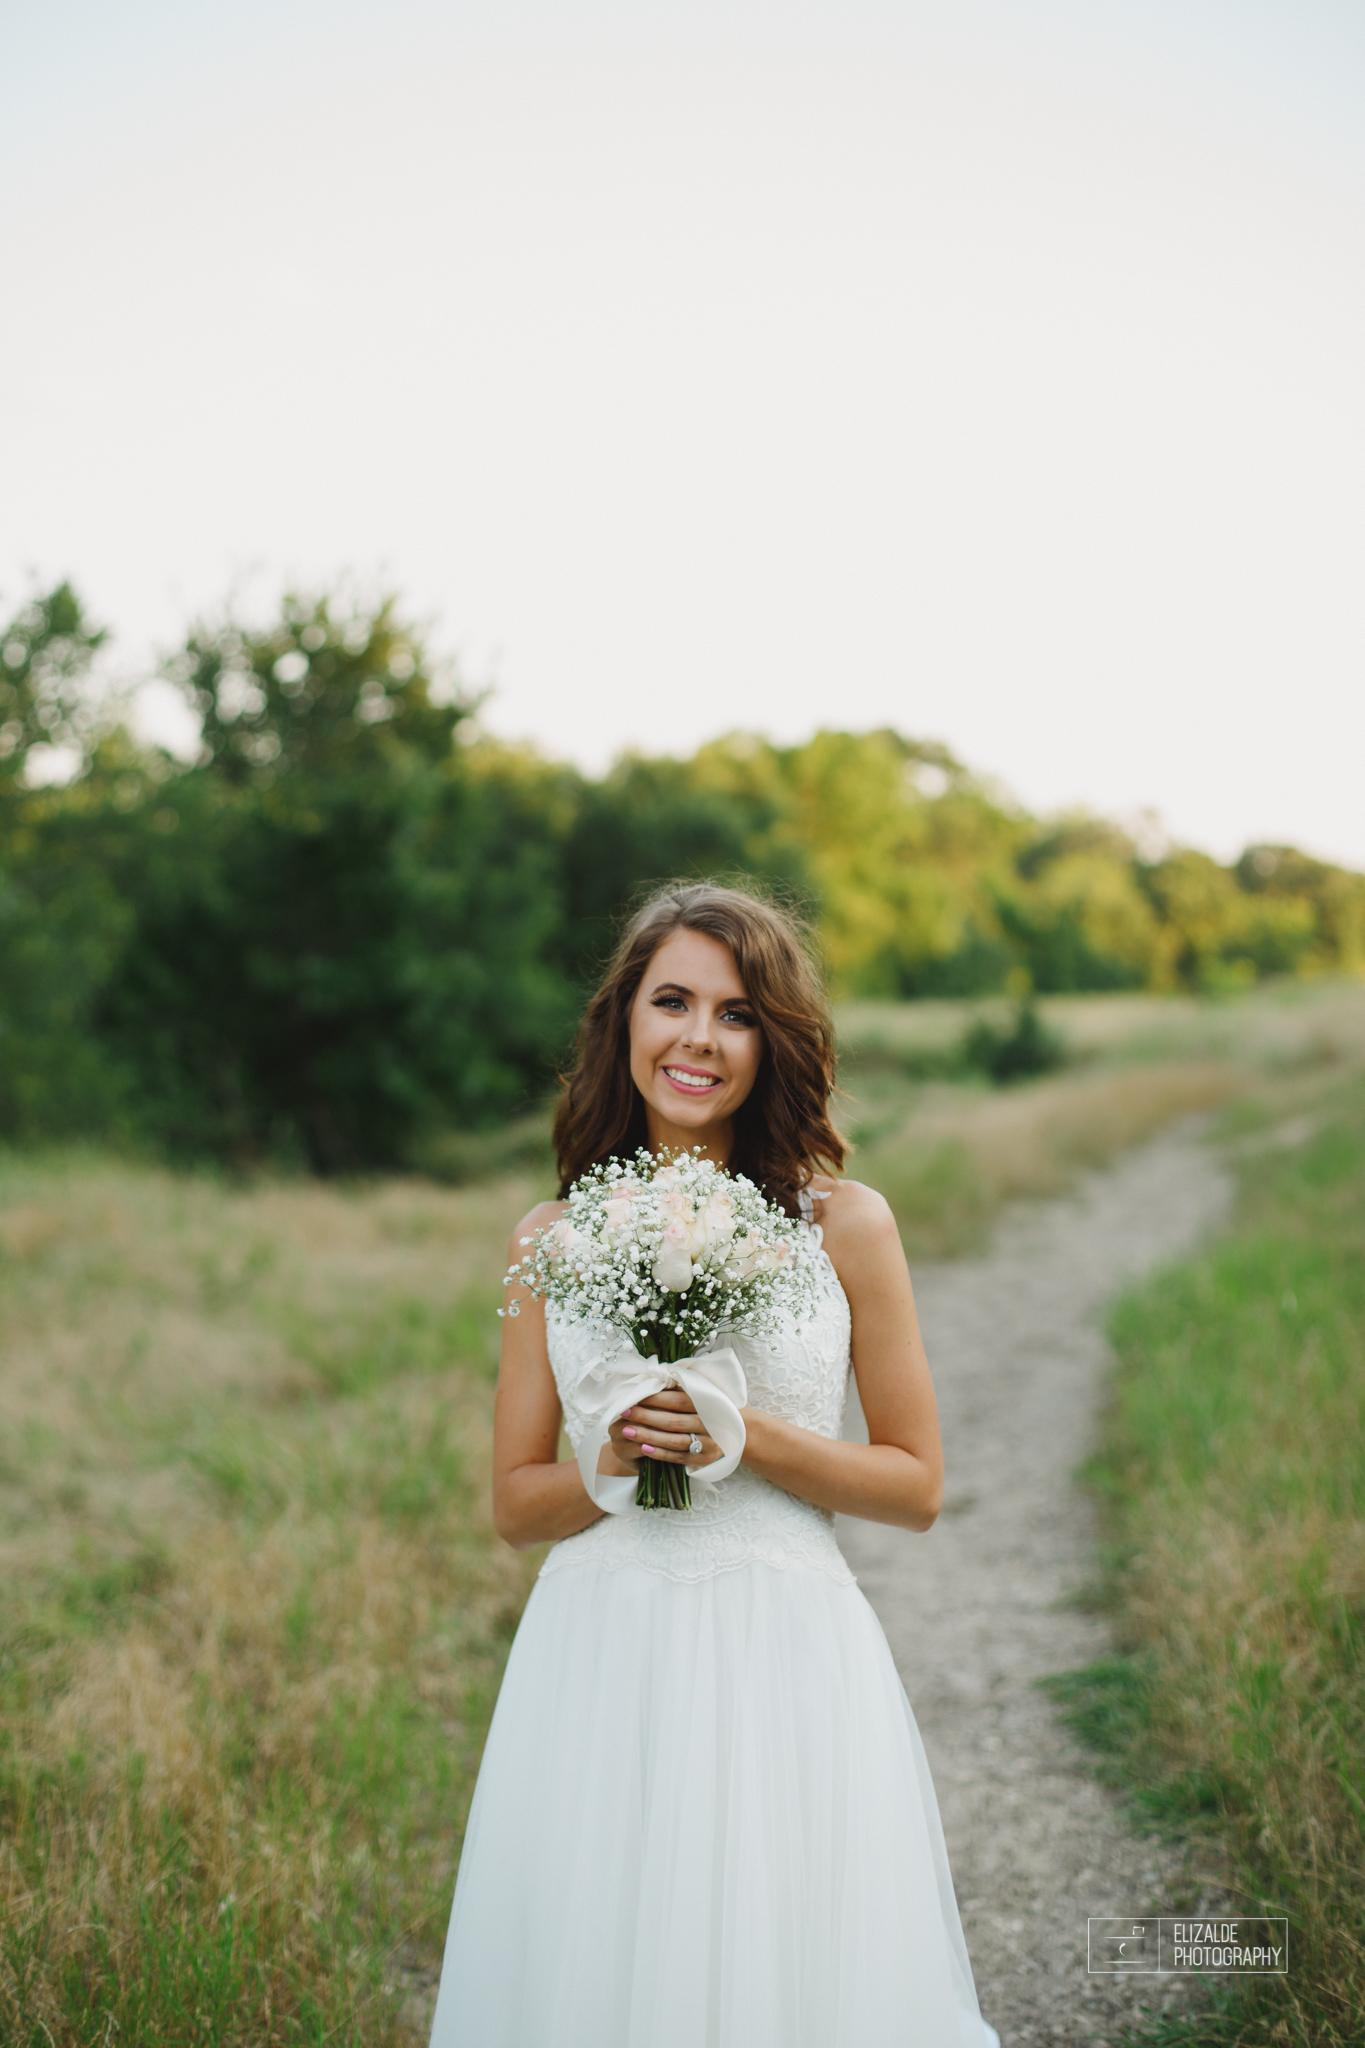 Bridal session_Dallas Photographer_Elizalde Photography_Denton photographer_ DFW Photographer_ Wedding Photographer_Baleigh15.jpg